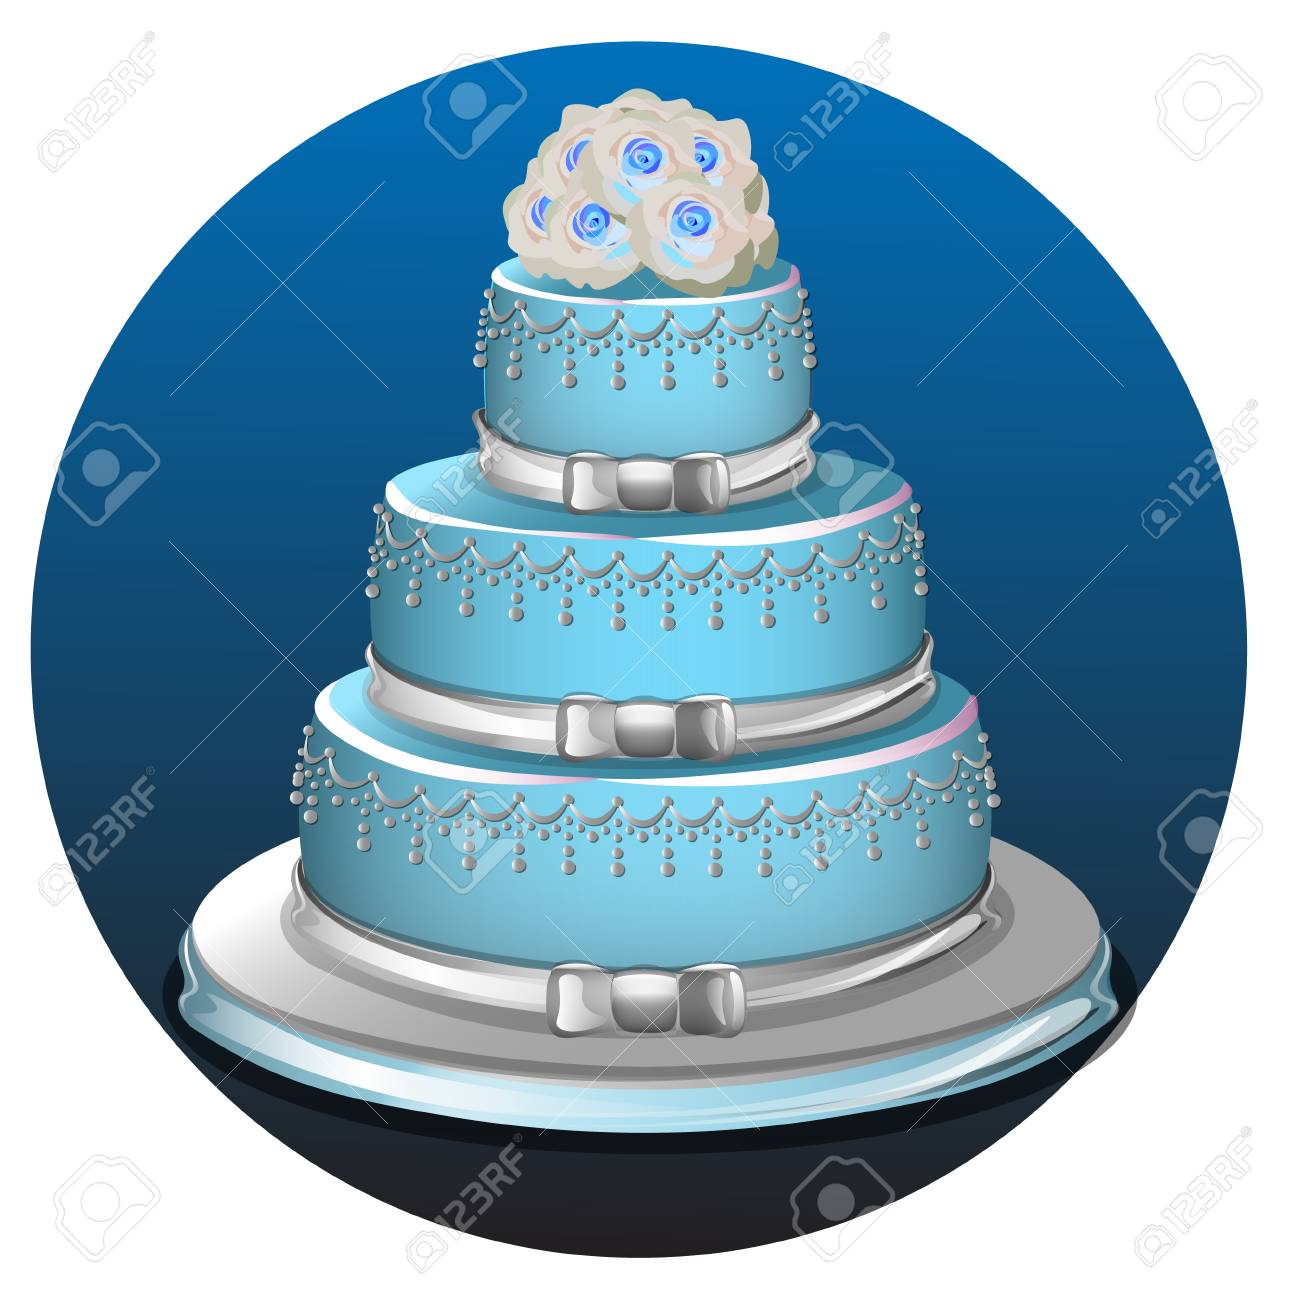 Realistic Three Tier Light Blue Wedding Cake And Decoration On